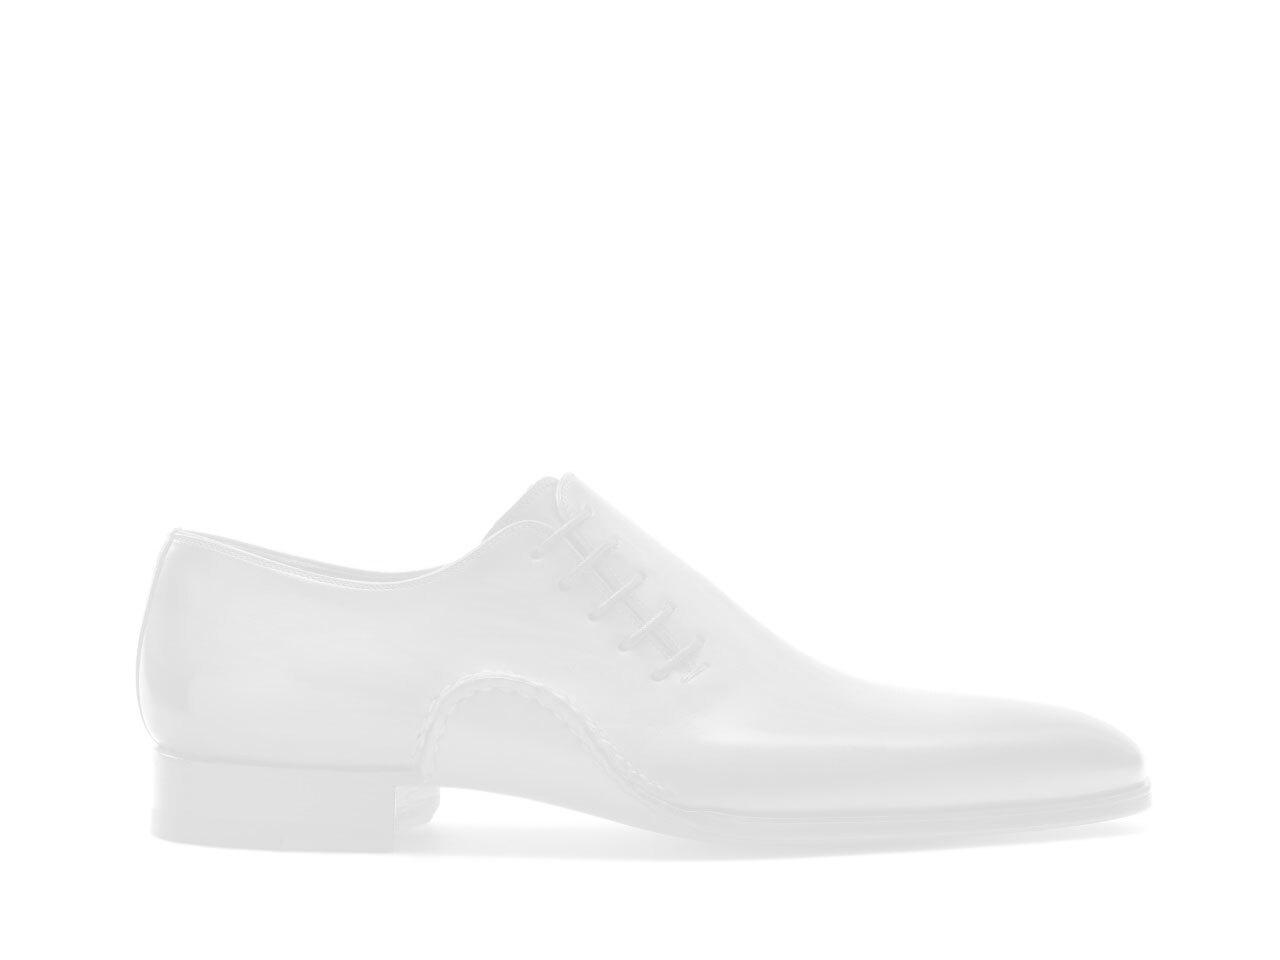 The Magnanni Essential Shoe Care Kit | Neutral